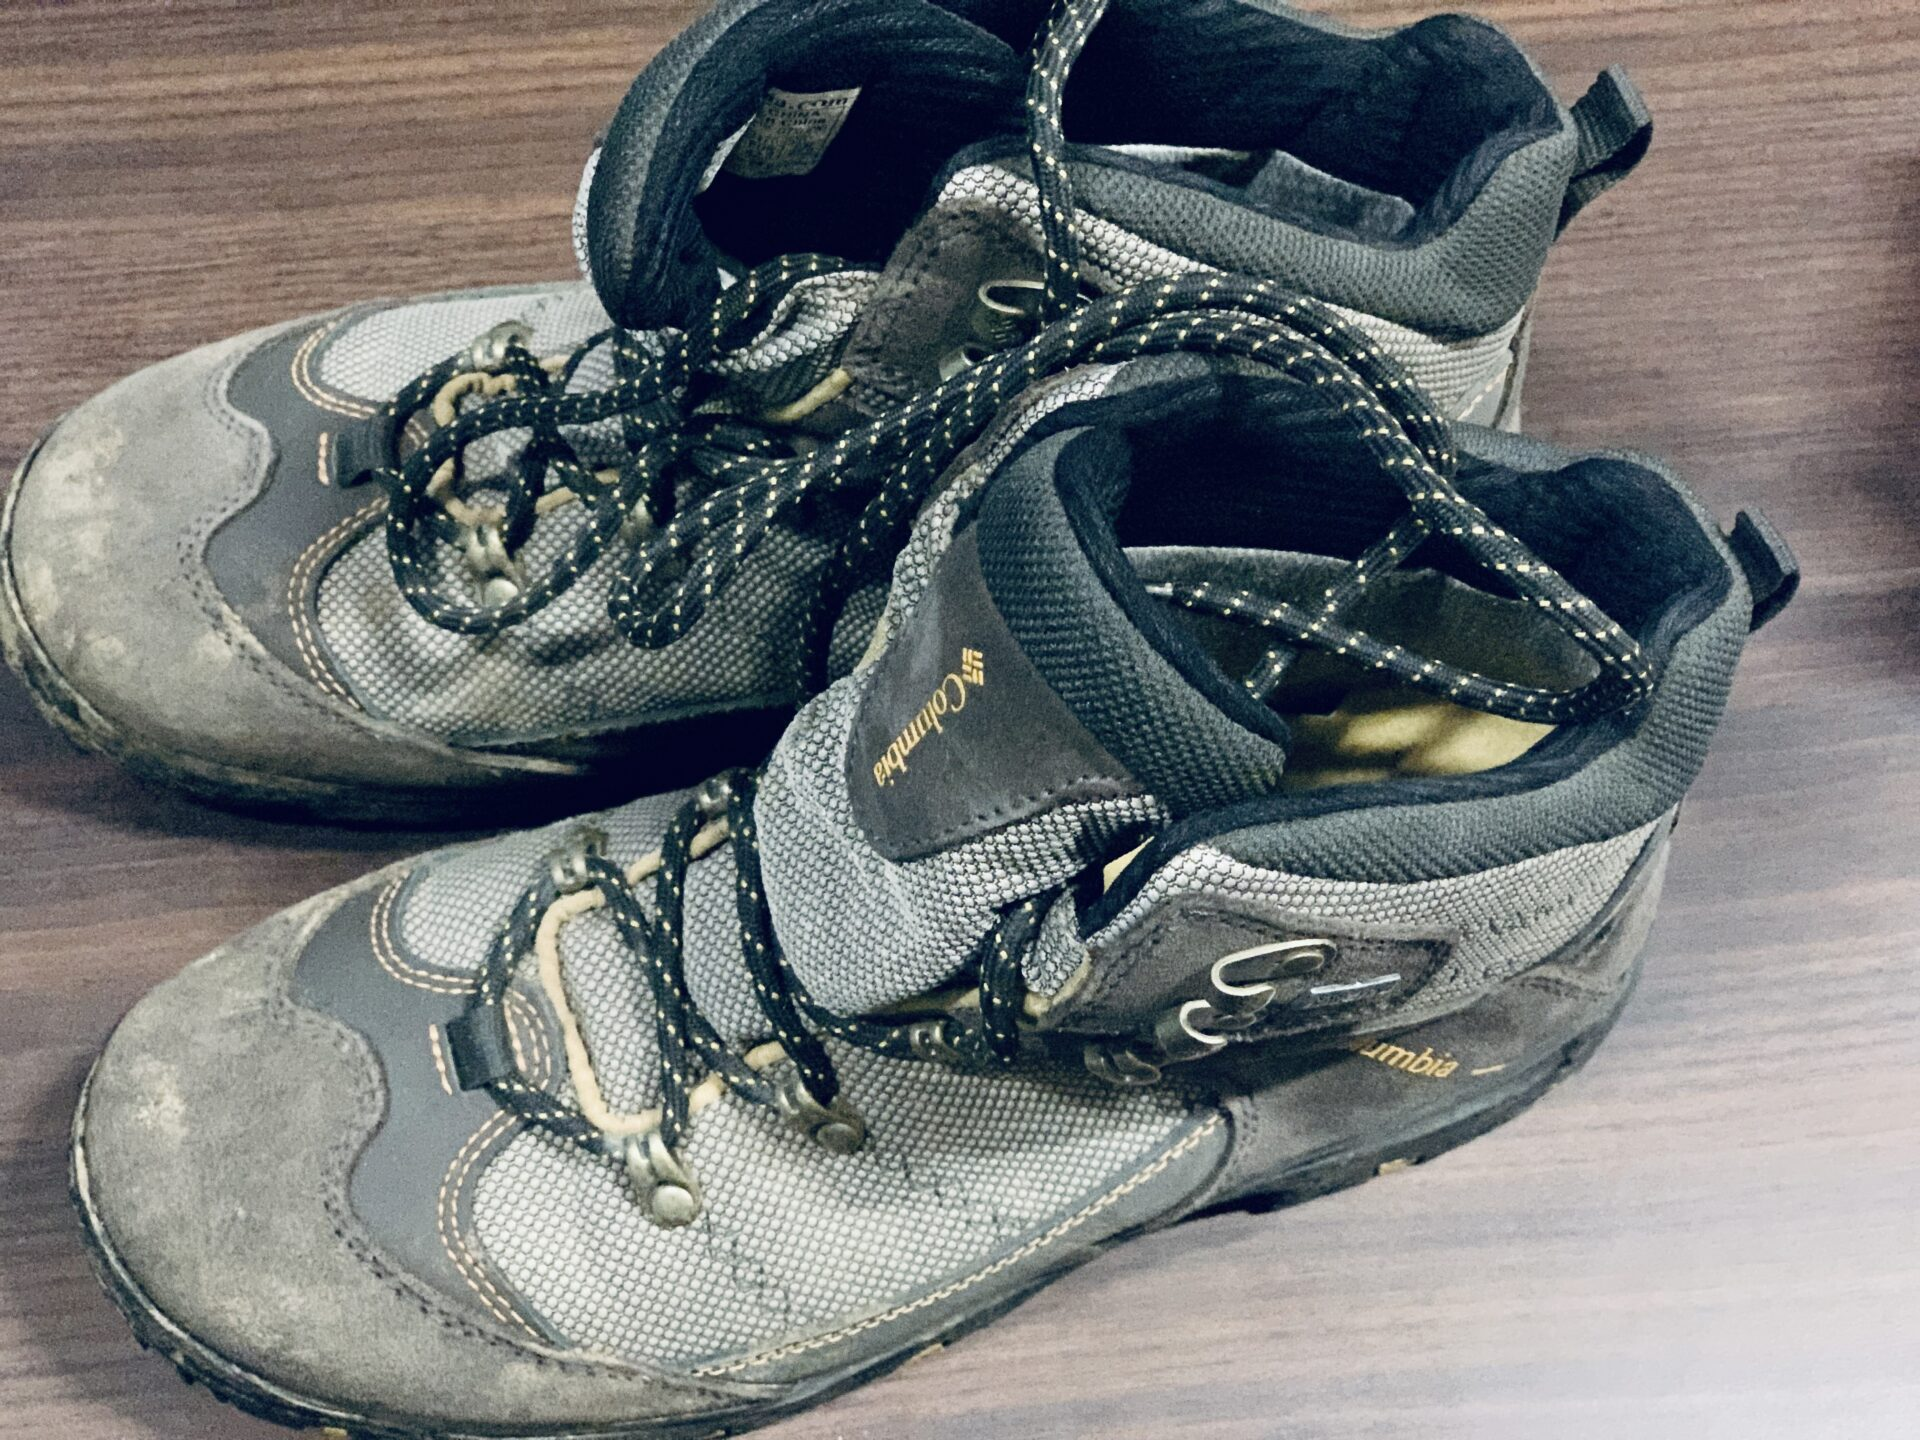 Columbia(コロンビア)Gore-Texの登山靴で富士山を登山した